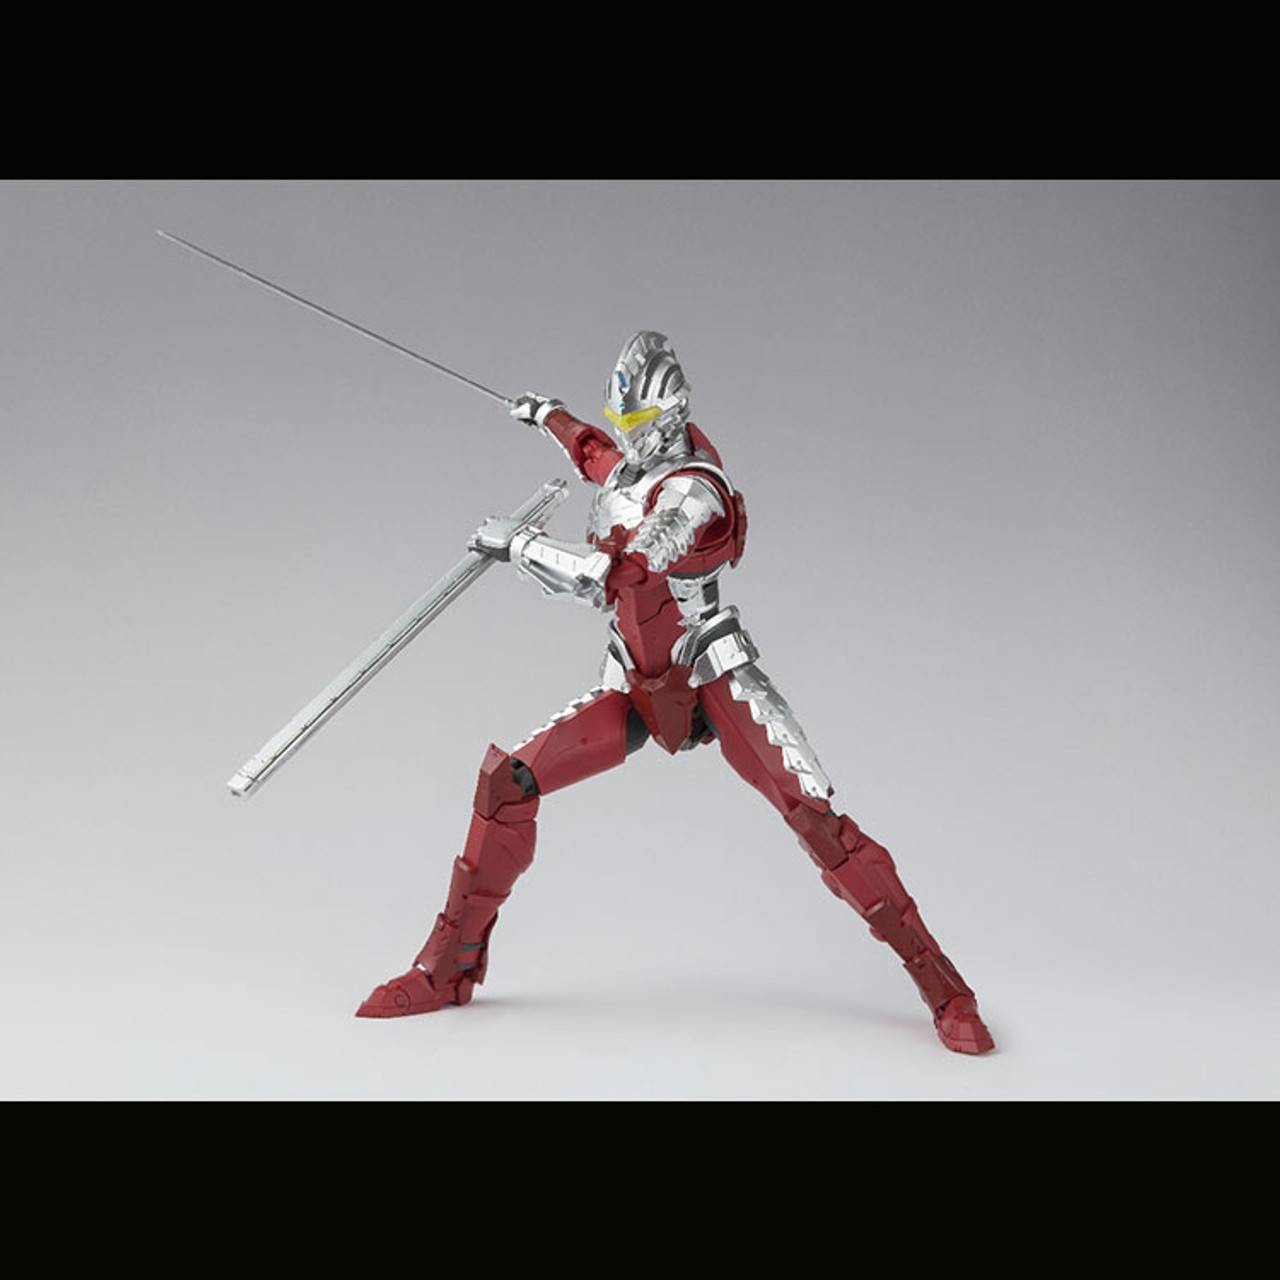 Ultraman Suit Ver7 The Animation ~ S.H.Figuarts